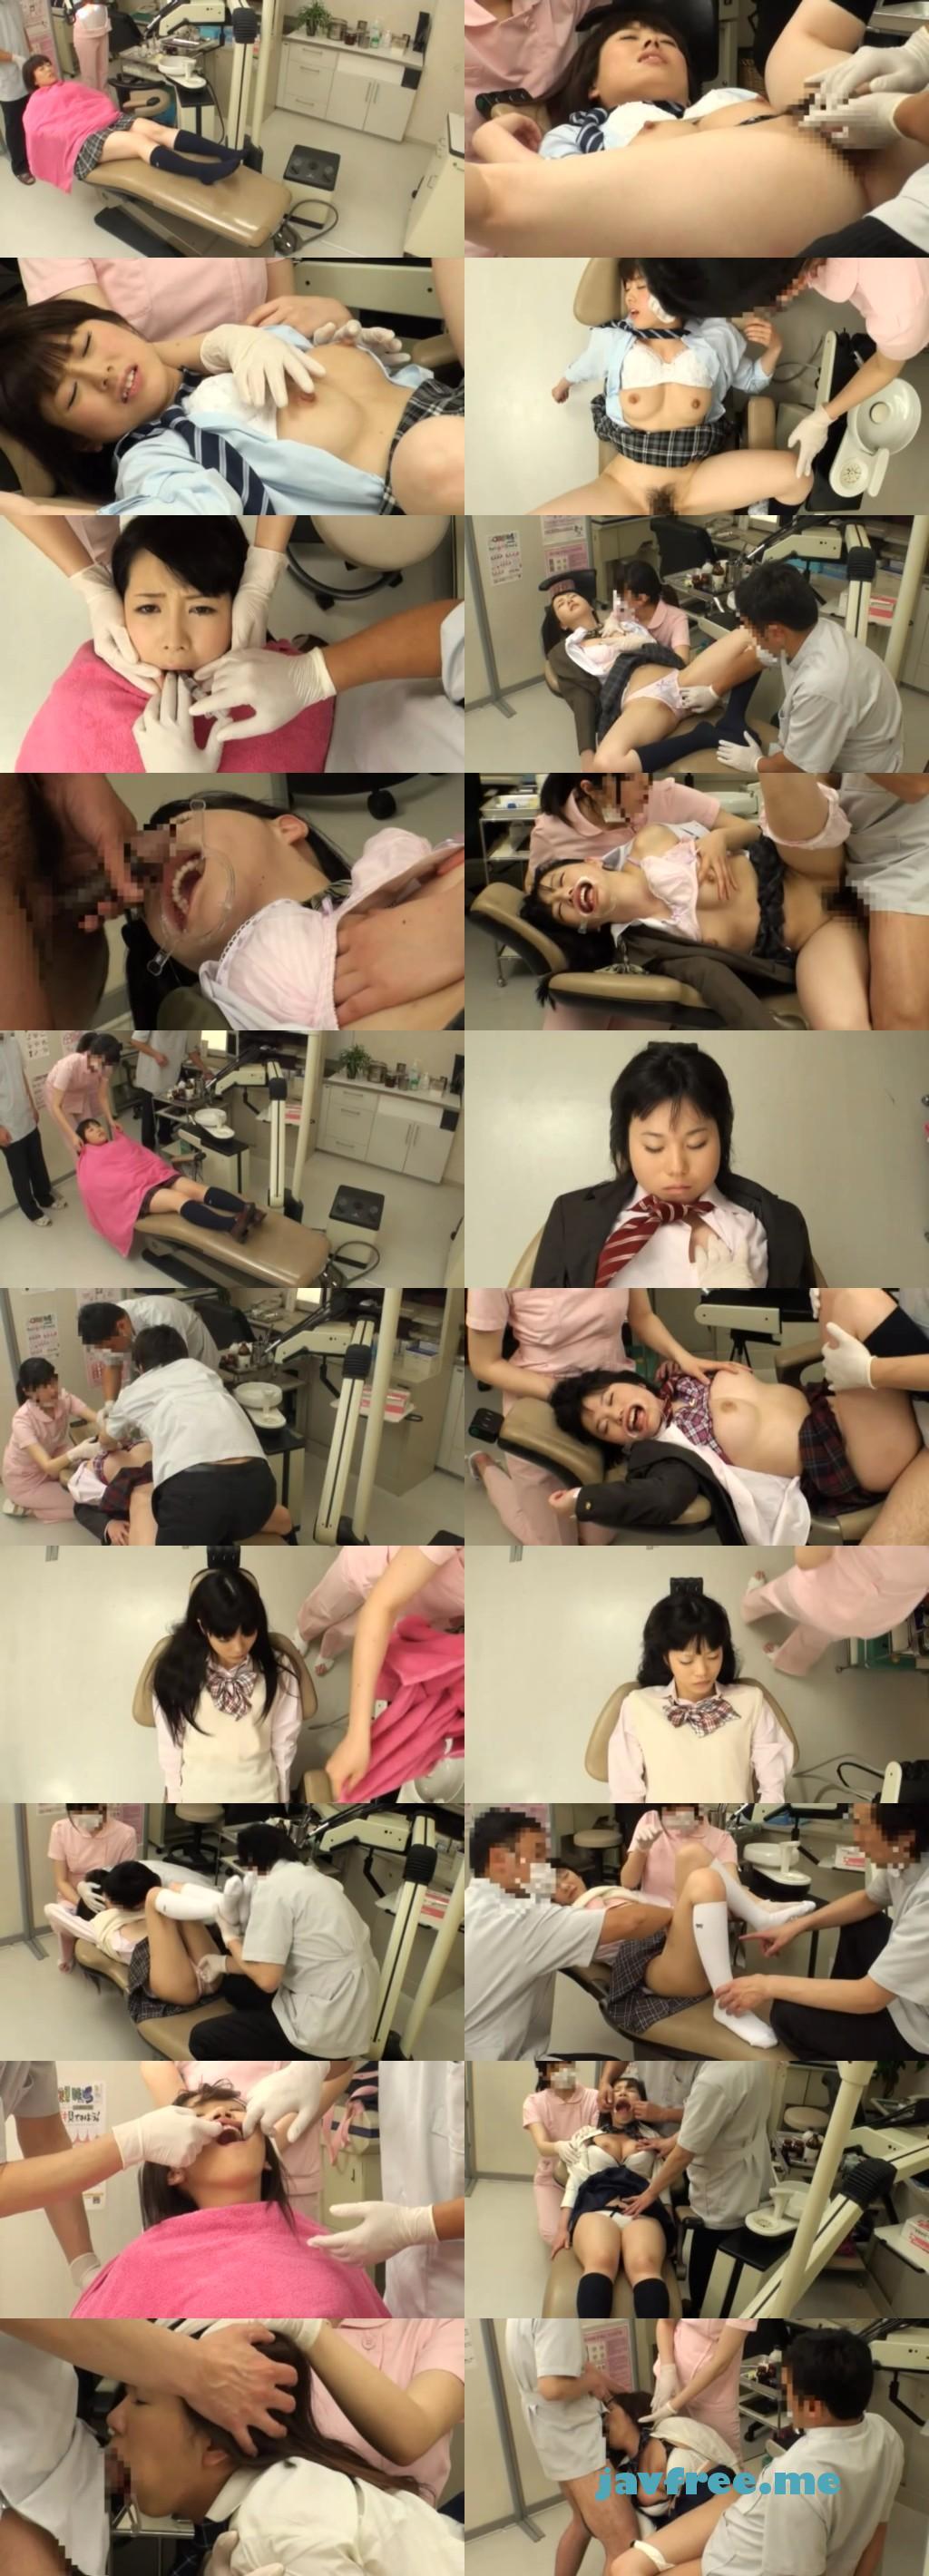 [BKSP 348] 歯科麻酔で性玩具にされた女子校生 2 BKSP